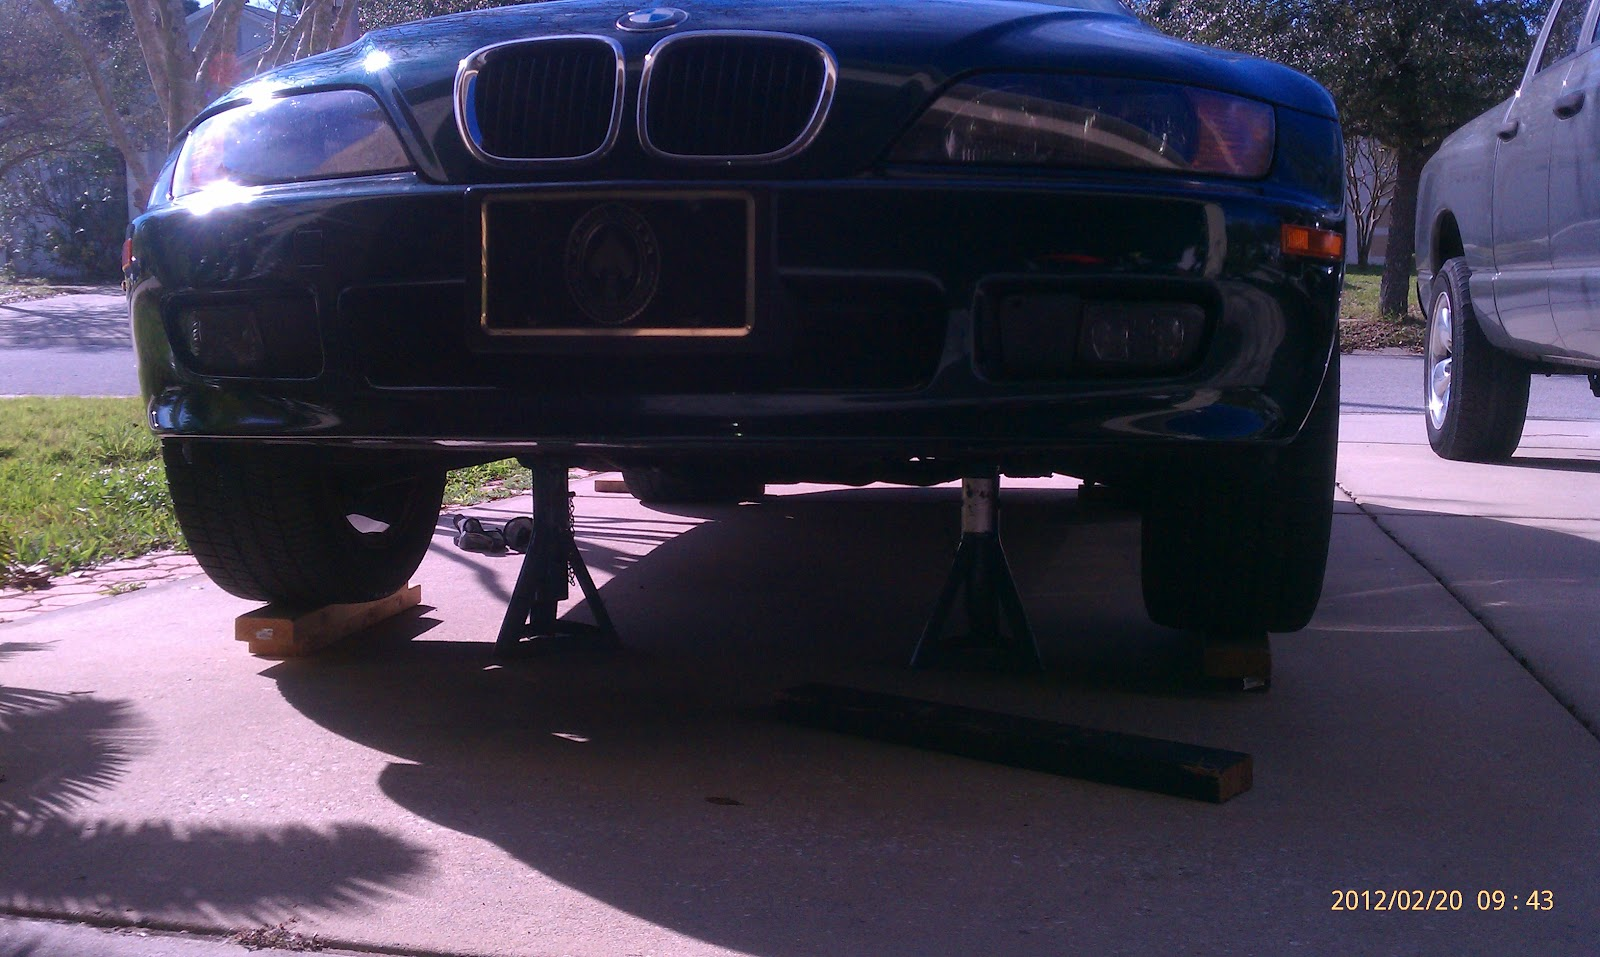 car jacked up - o2 sensor is on the left side underneath